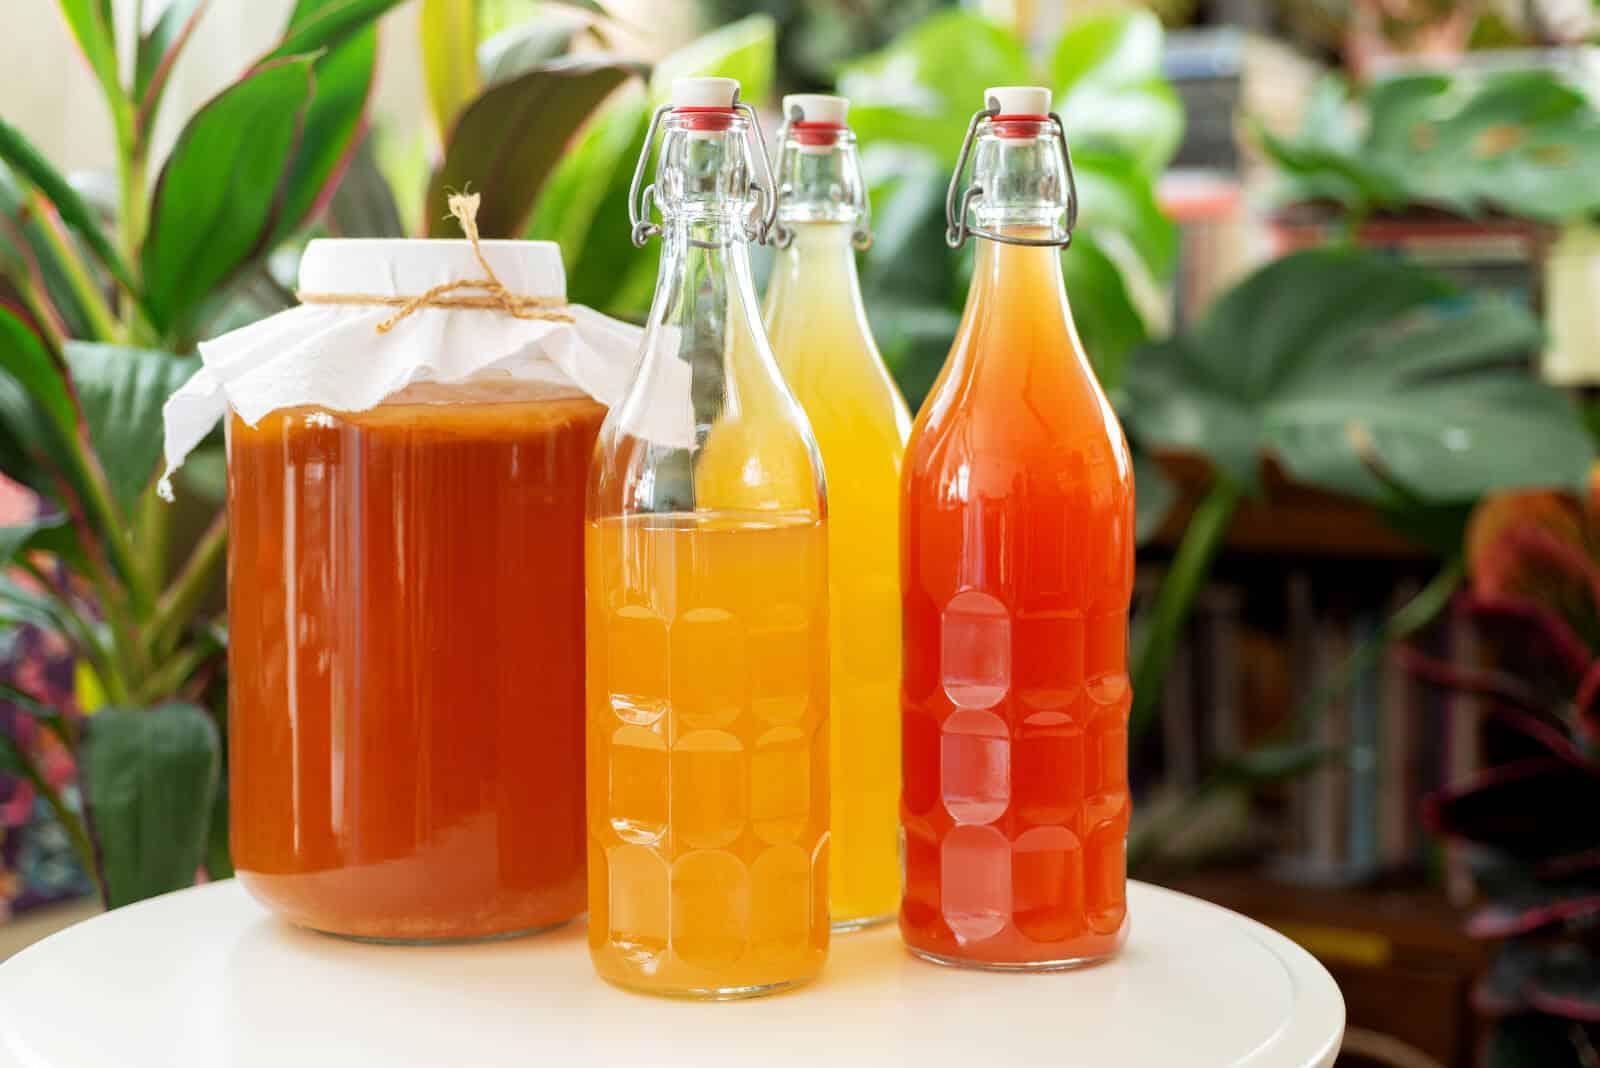 What are probiotics: homemade Kombucha tea in glass bottles